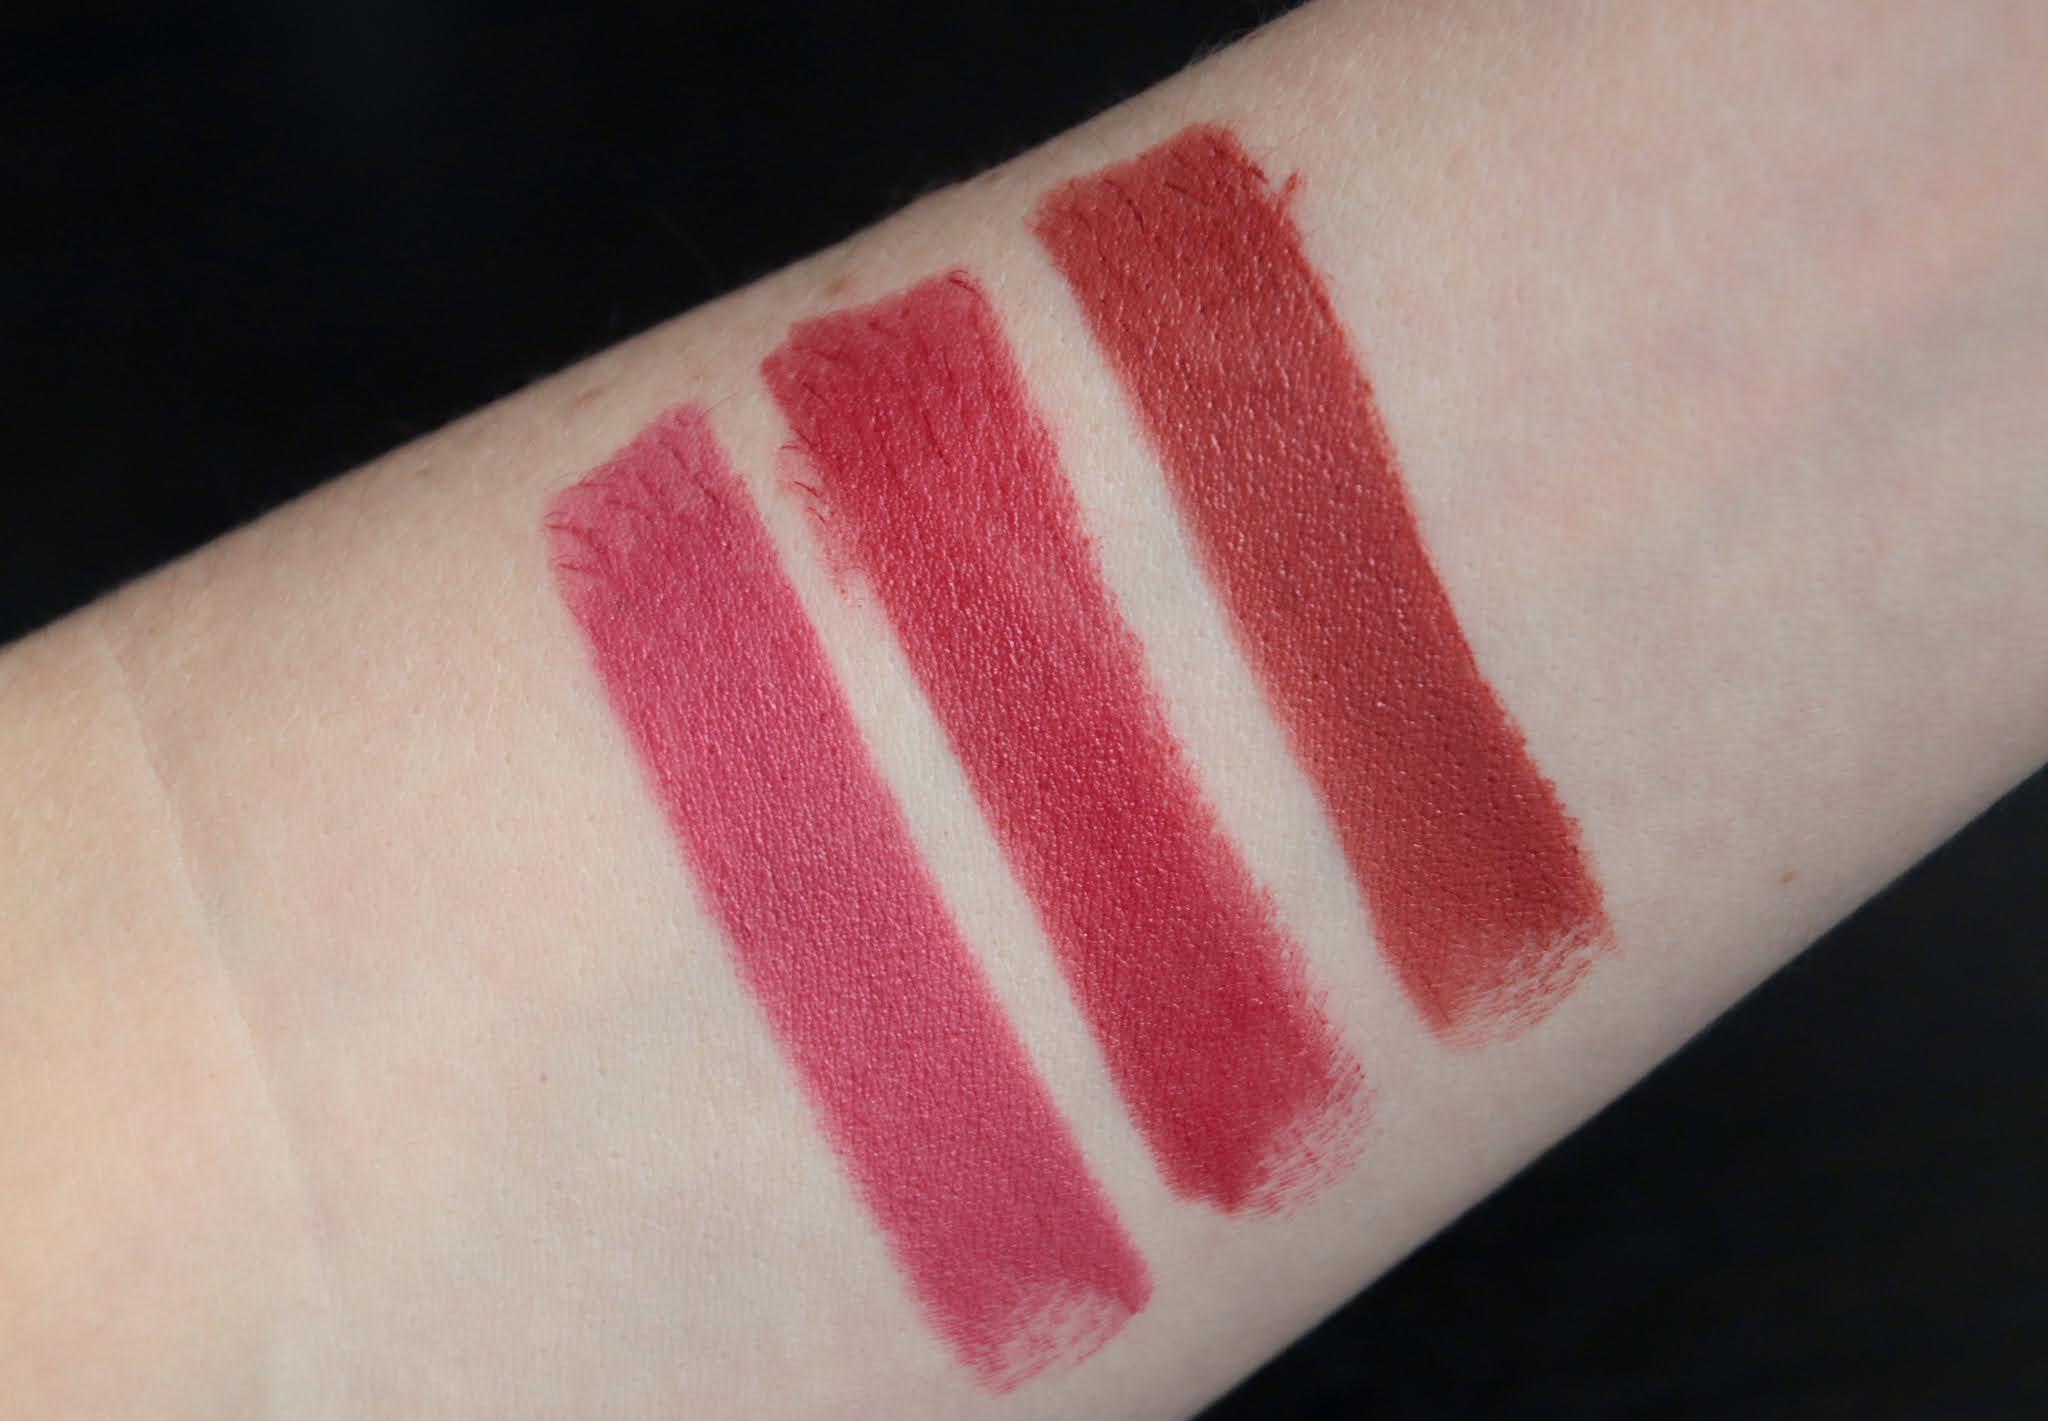 boho rouge à lèvres naturels 106 103 111